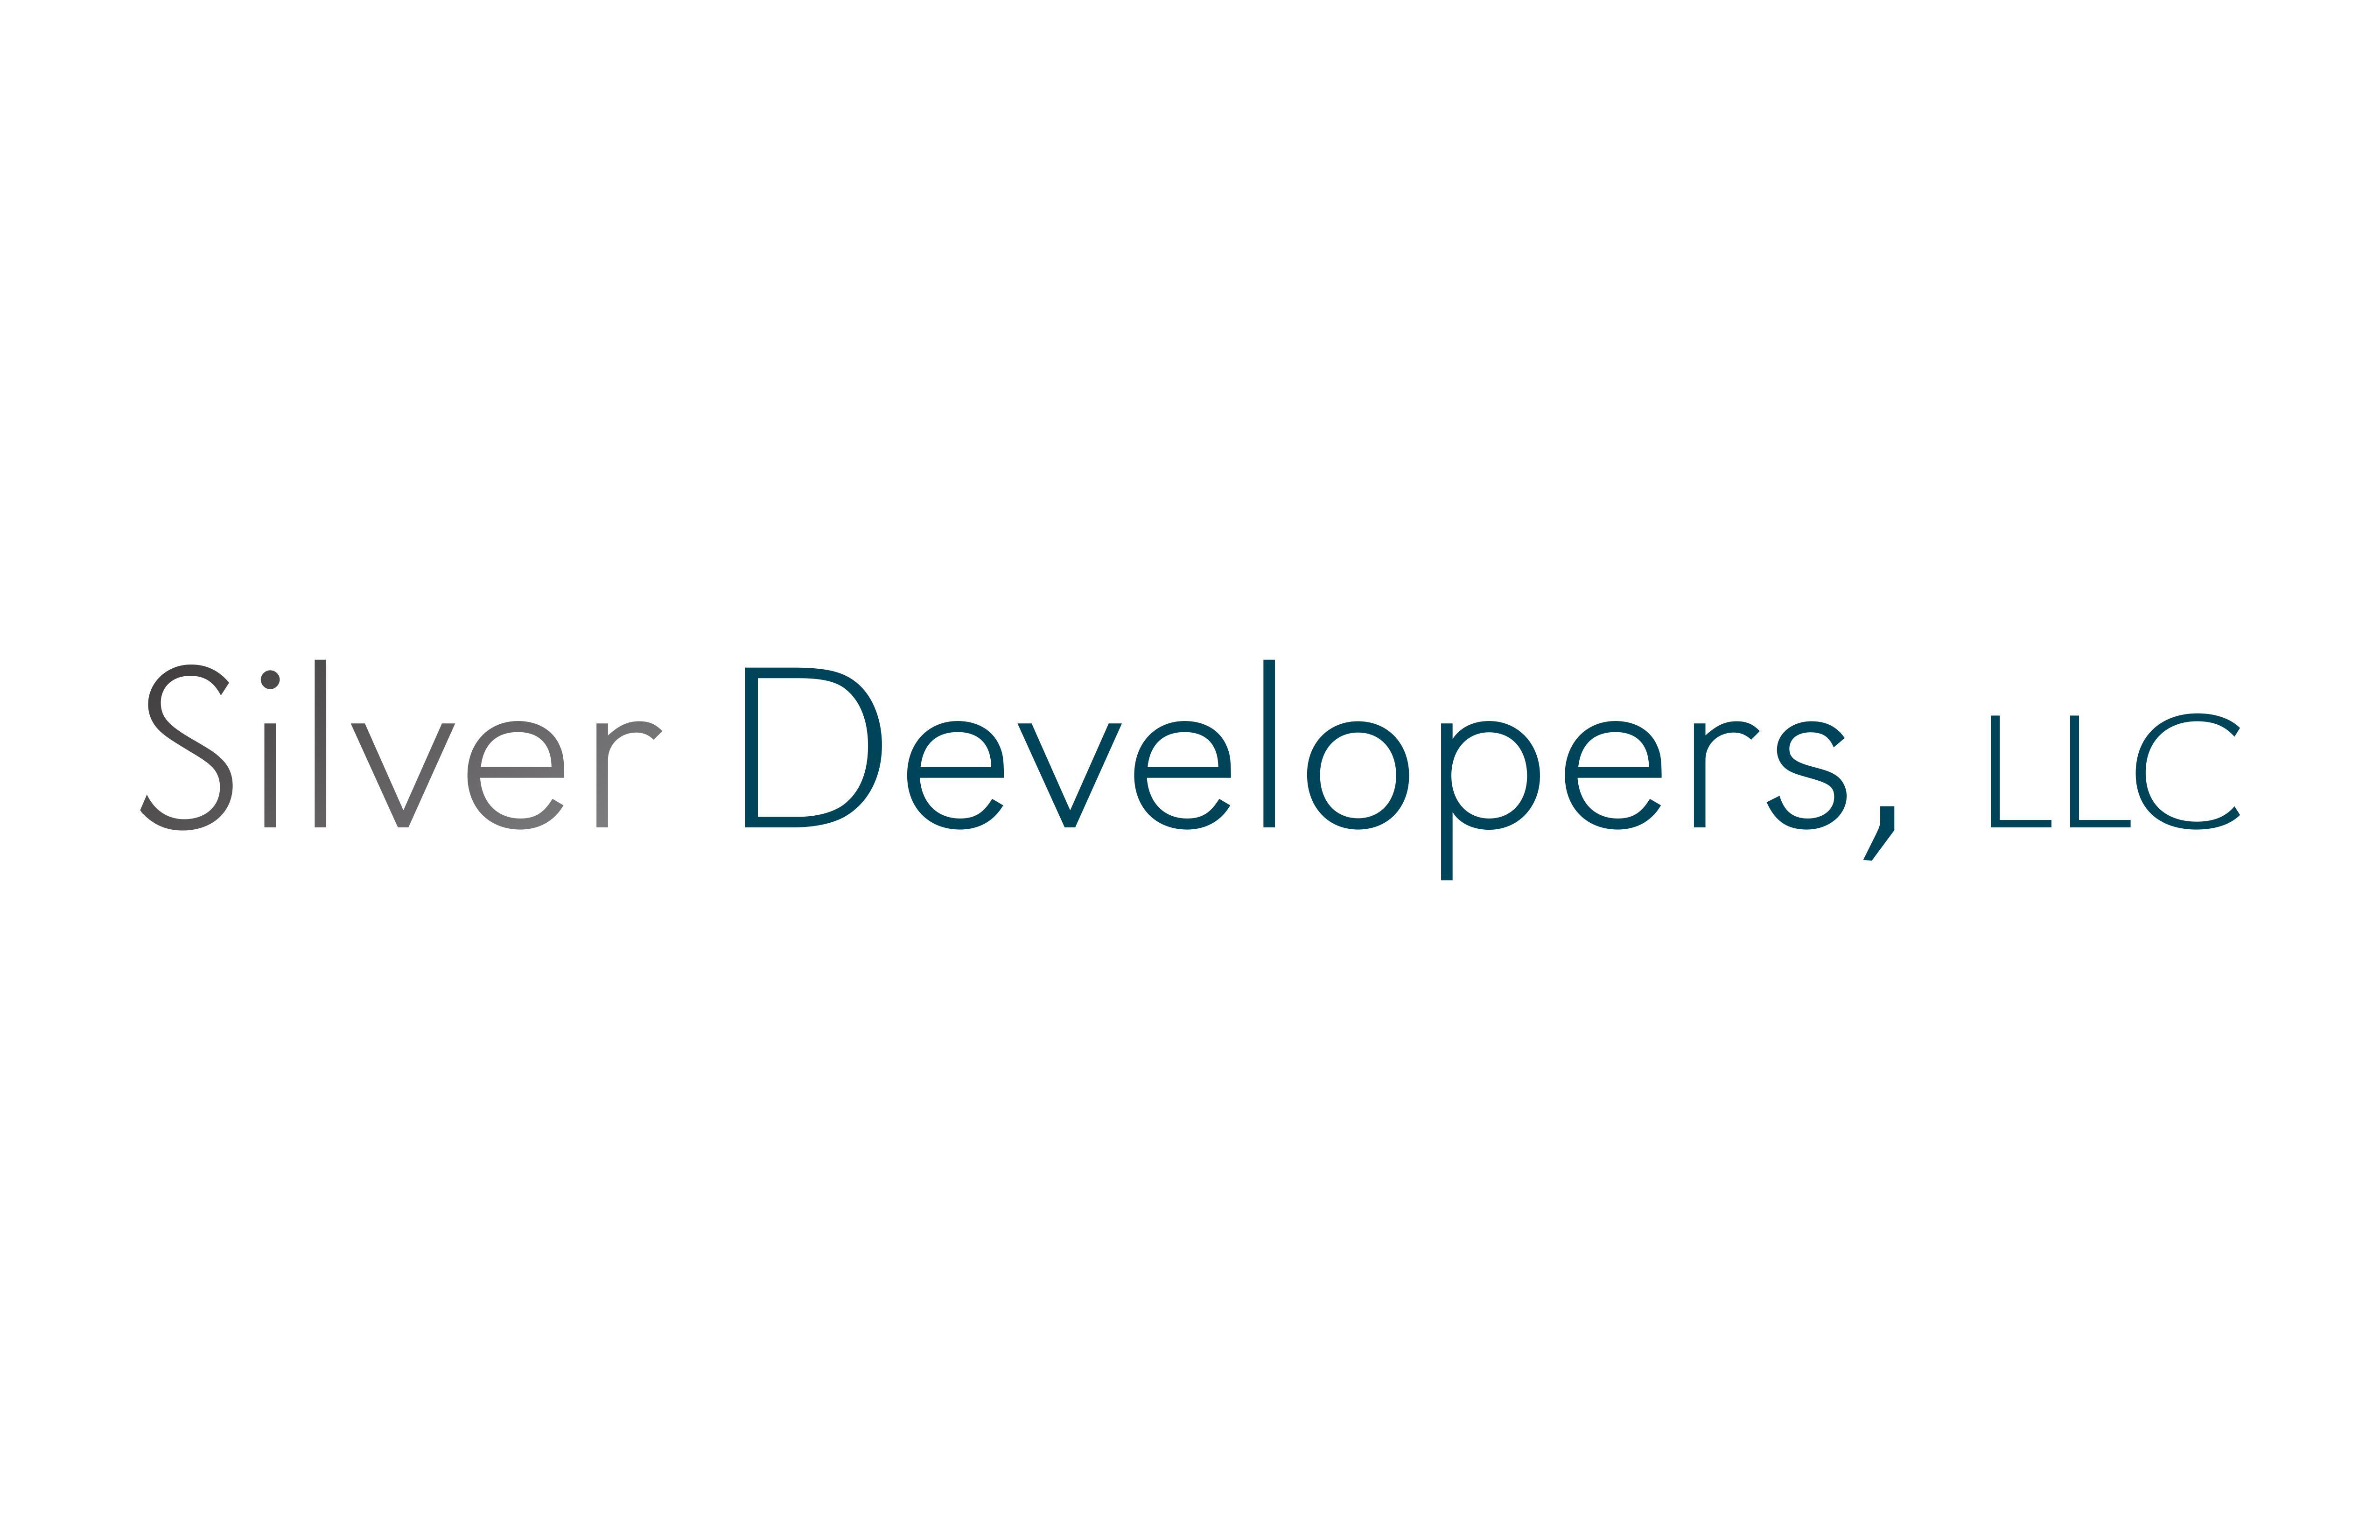 Sponsor Silver Developers